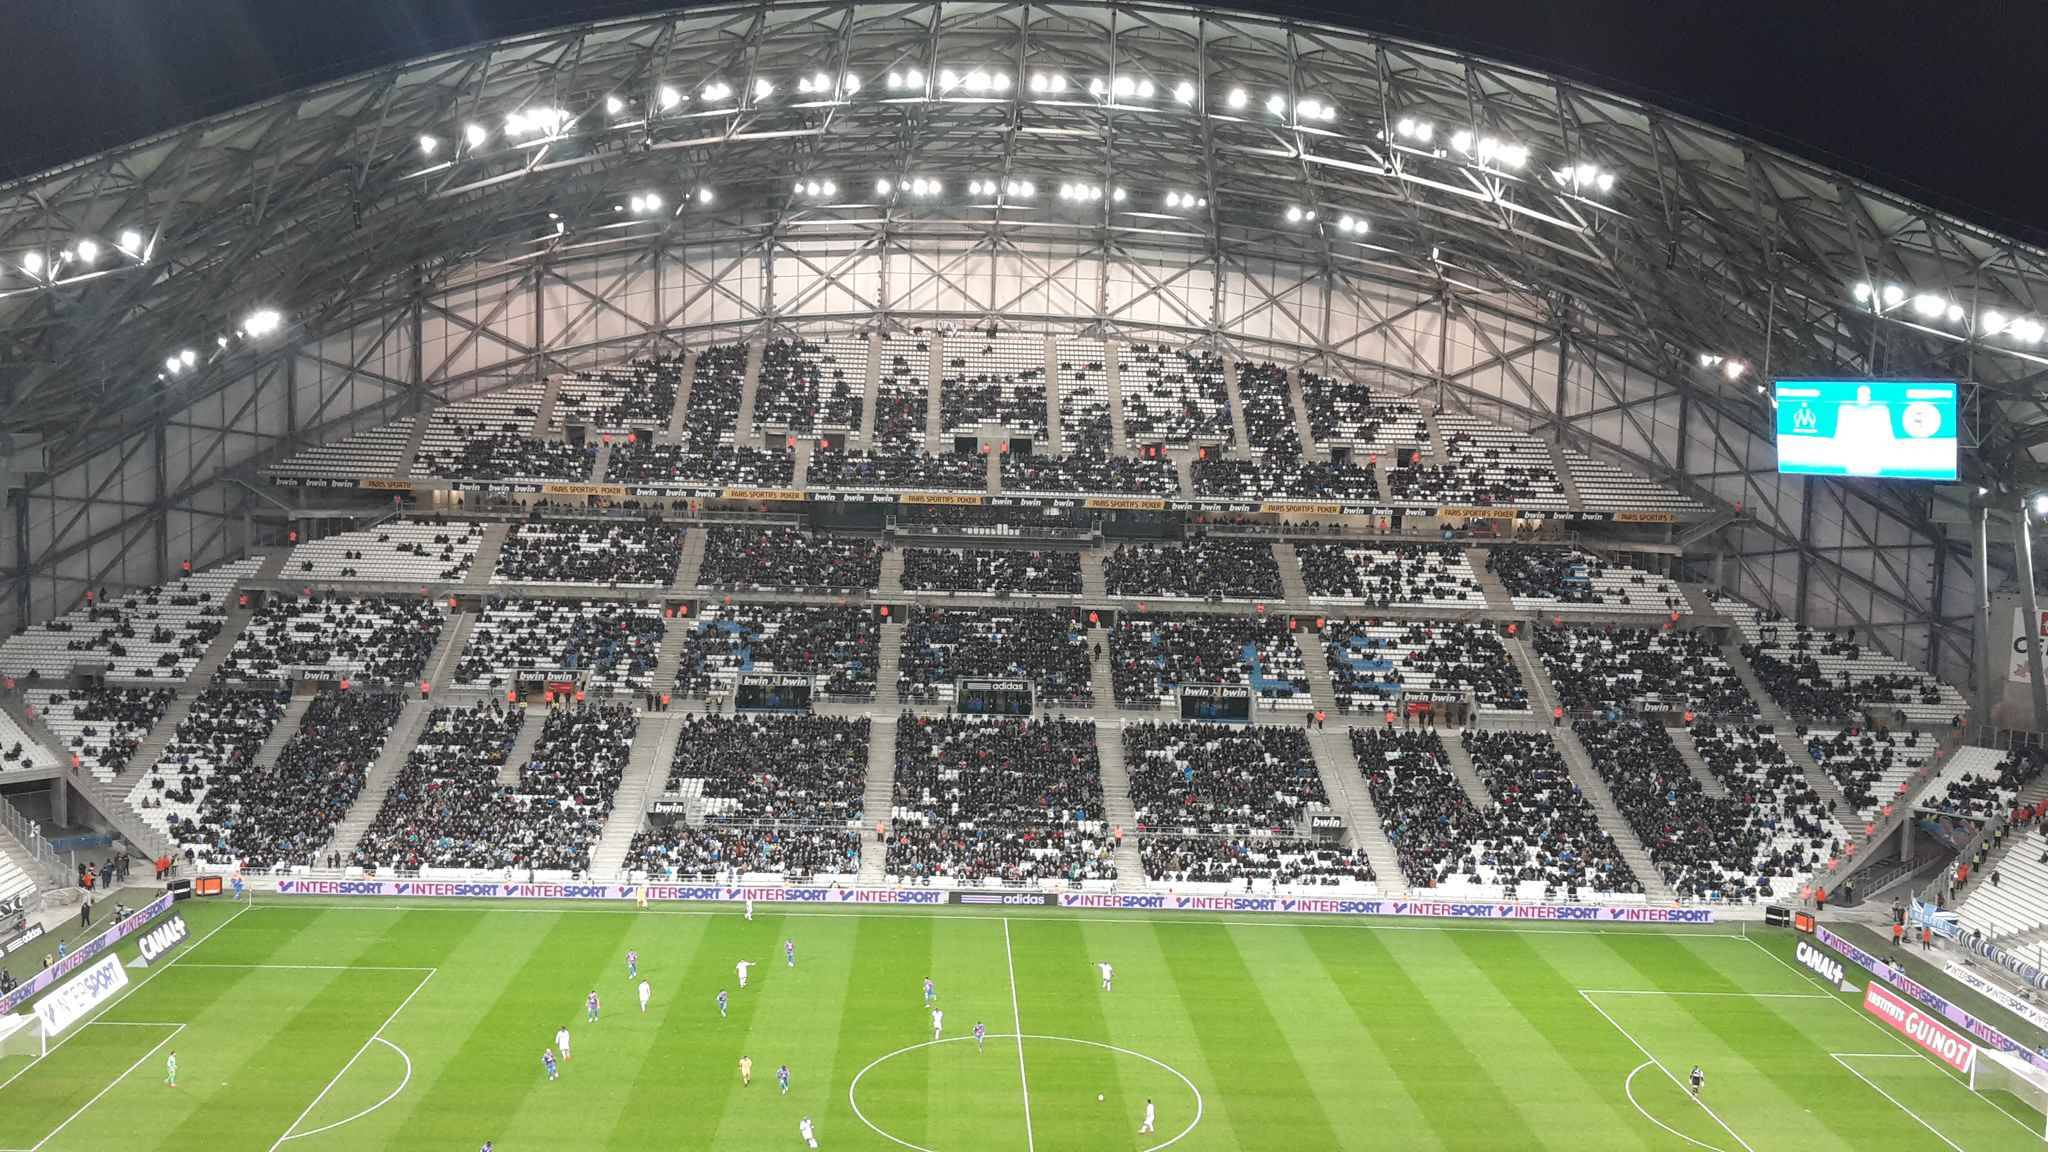 Marseille le stade v lodrome co te la ville 13 5 for Porte 7 stade velodrome